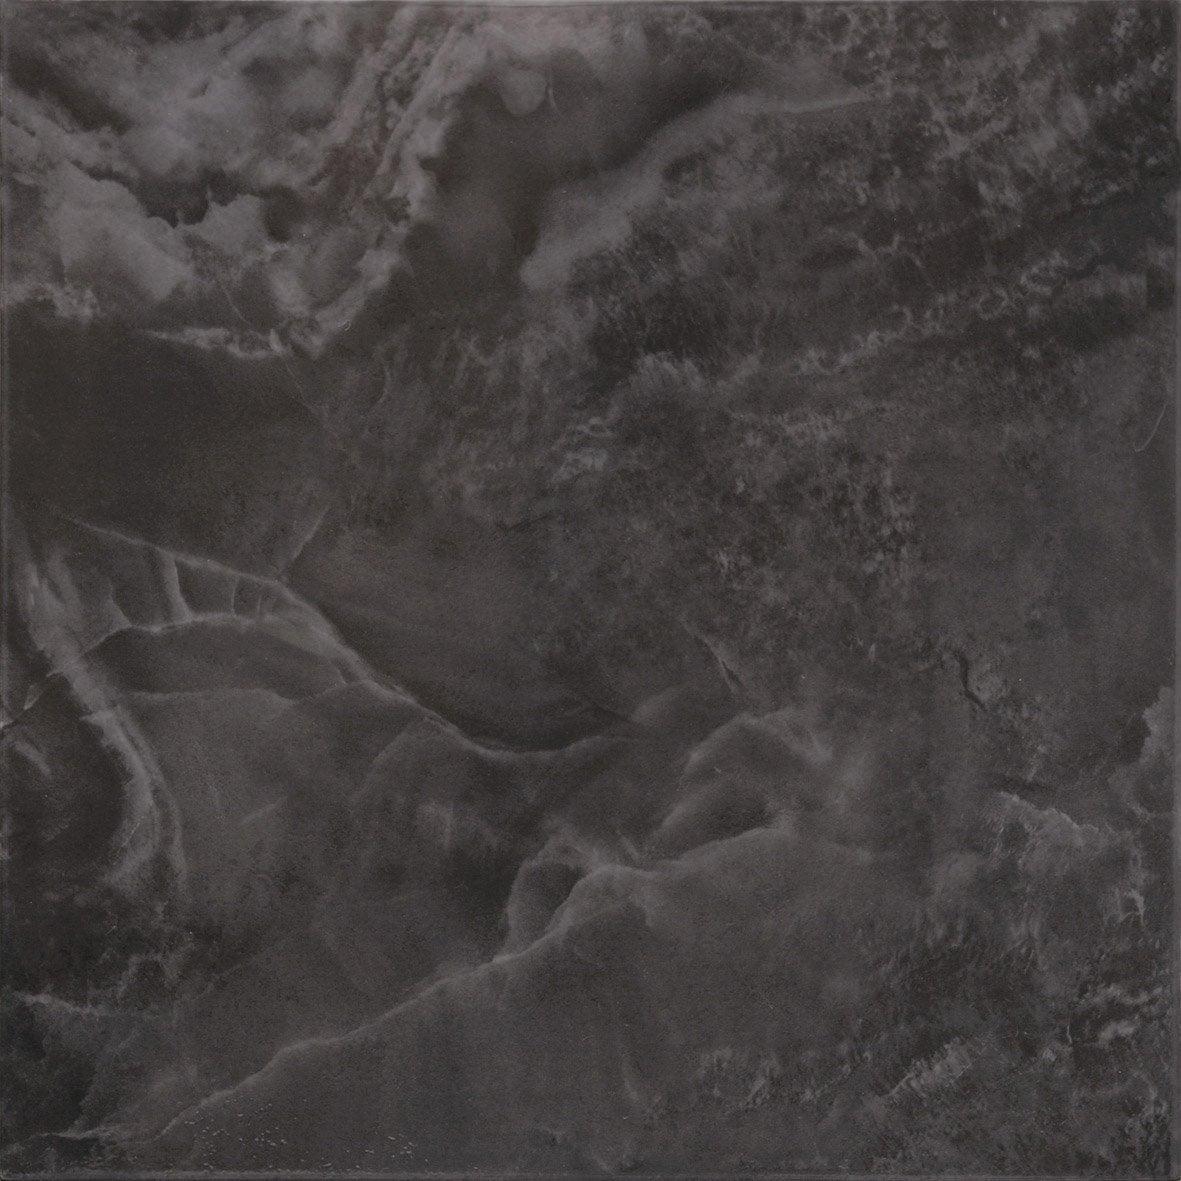 carrelage sol et mur noir effet marbre dafne l 34 x l 34. Black Bedroom Furniture Sets. Home Design Ideas